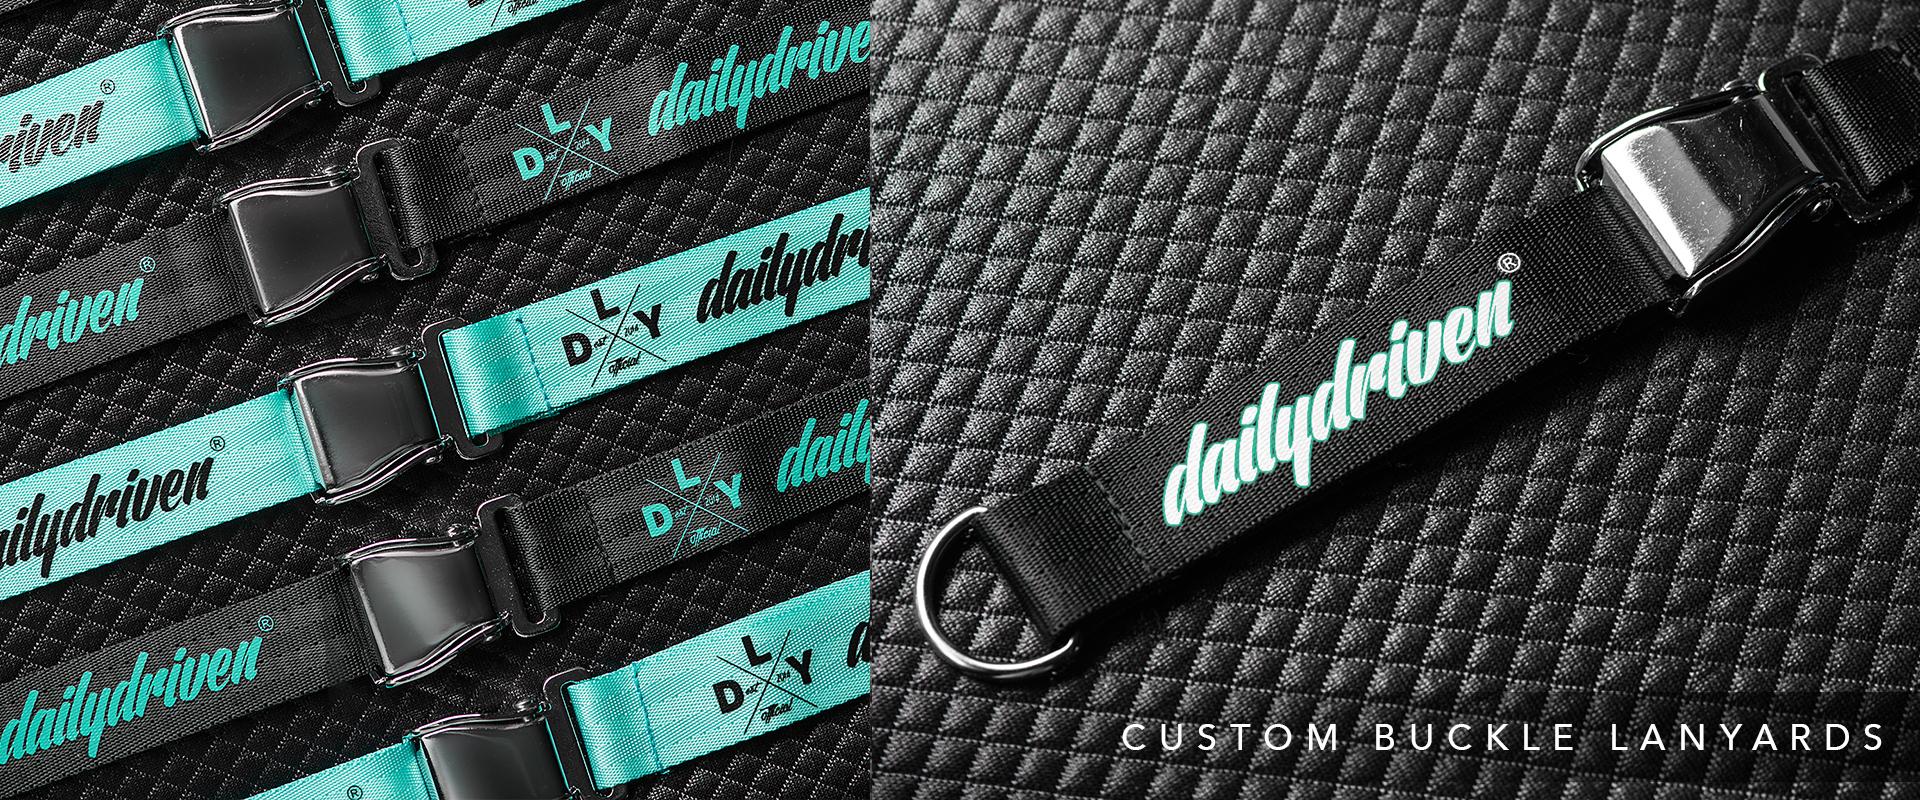 JoshMackey-Merchandise-DailyDriven.jpg